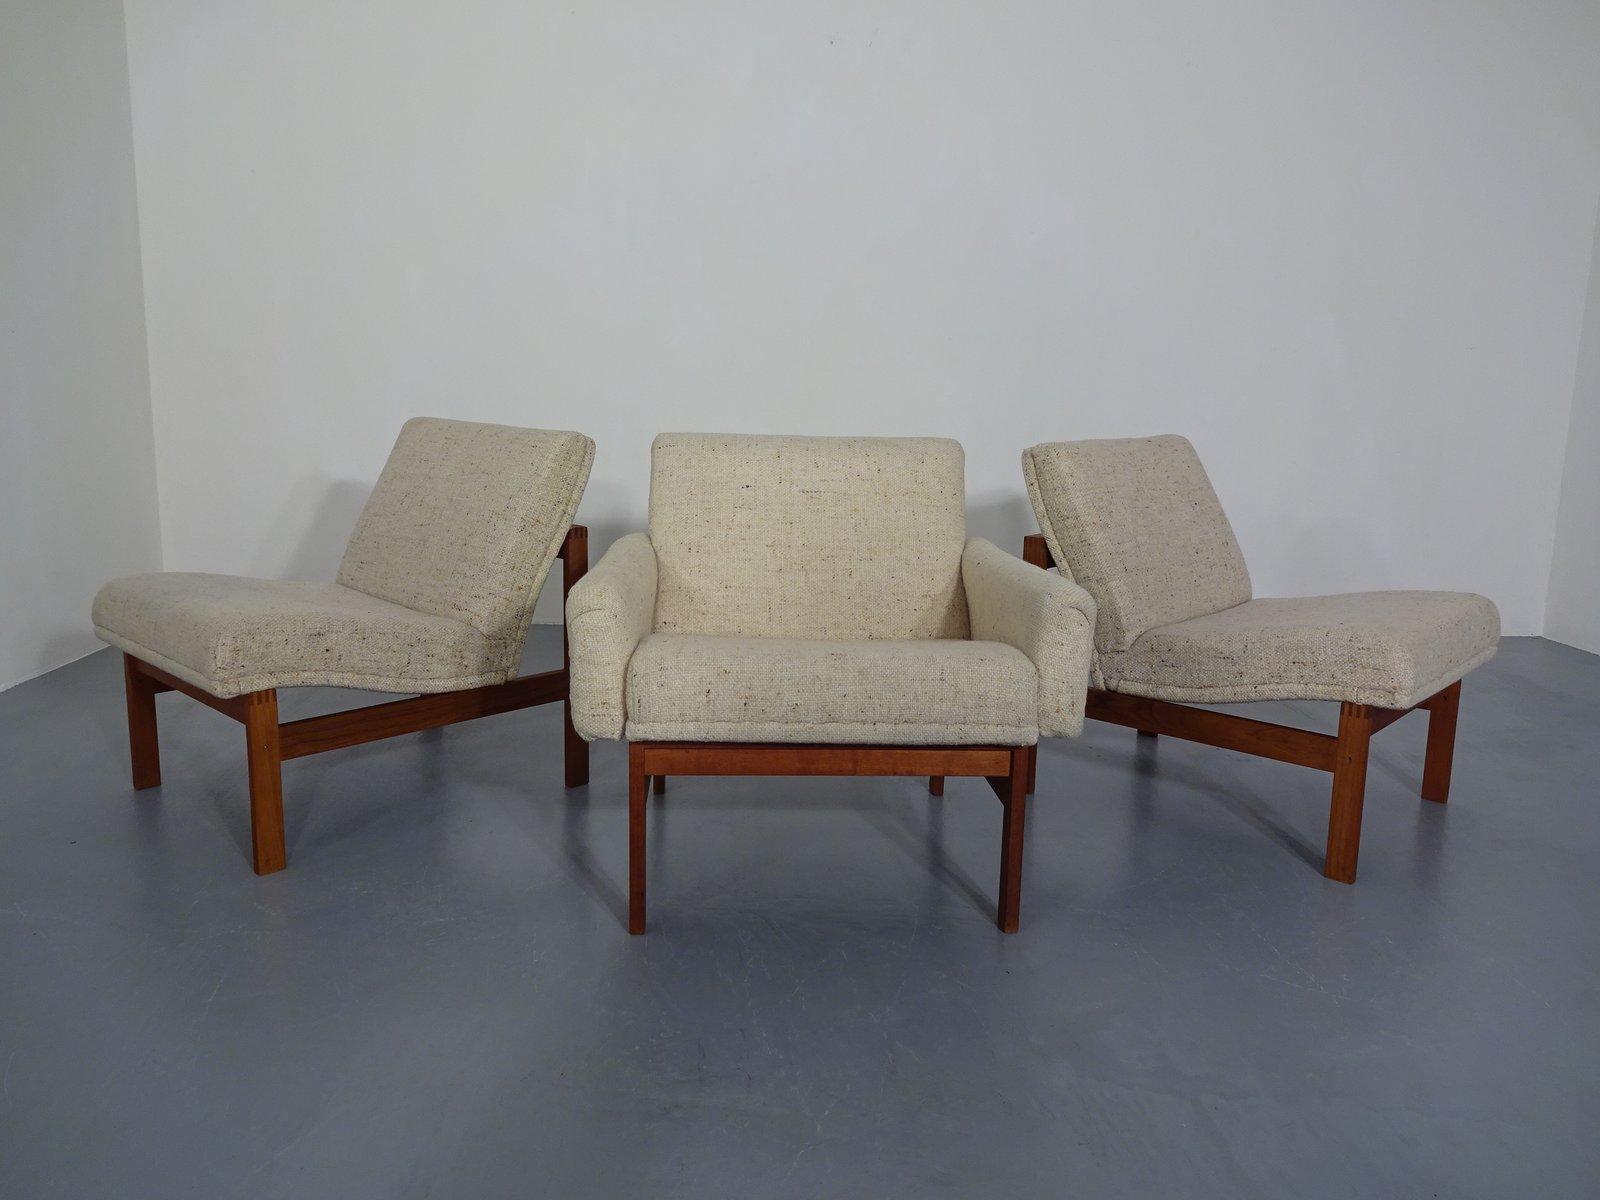 Modulare Sessel von Ole Gjerløv-Knudsen für France & Søn, 1962, 3er Se...